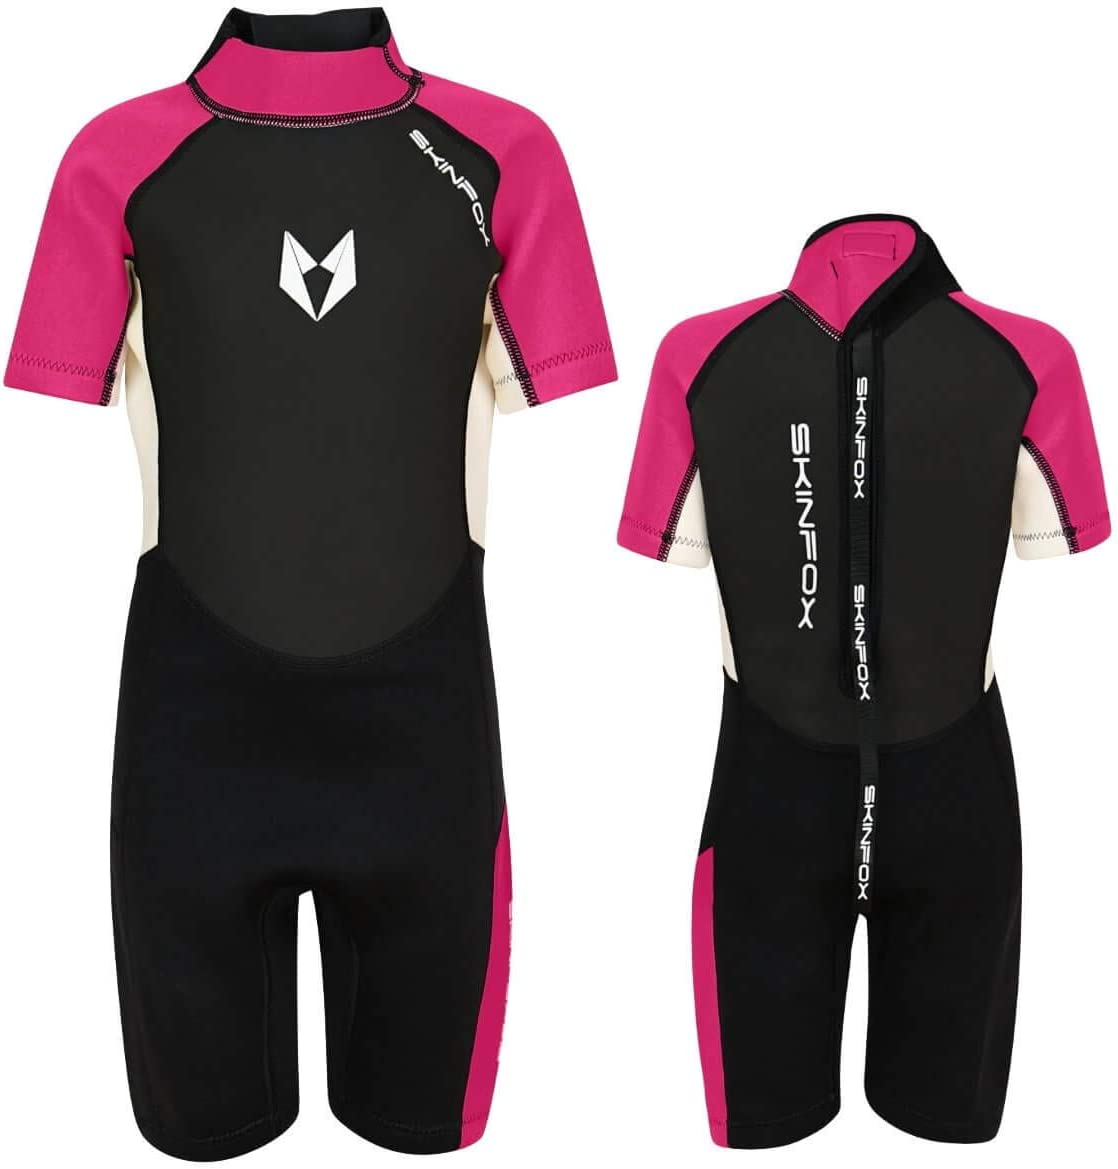 Kinder Shorty Neoprenanzug Schwimmanzug pink SKINFOX Scout 2-16 J